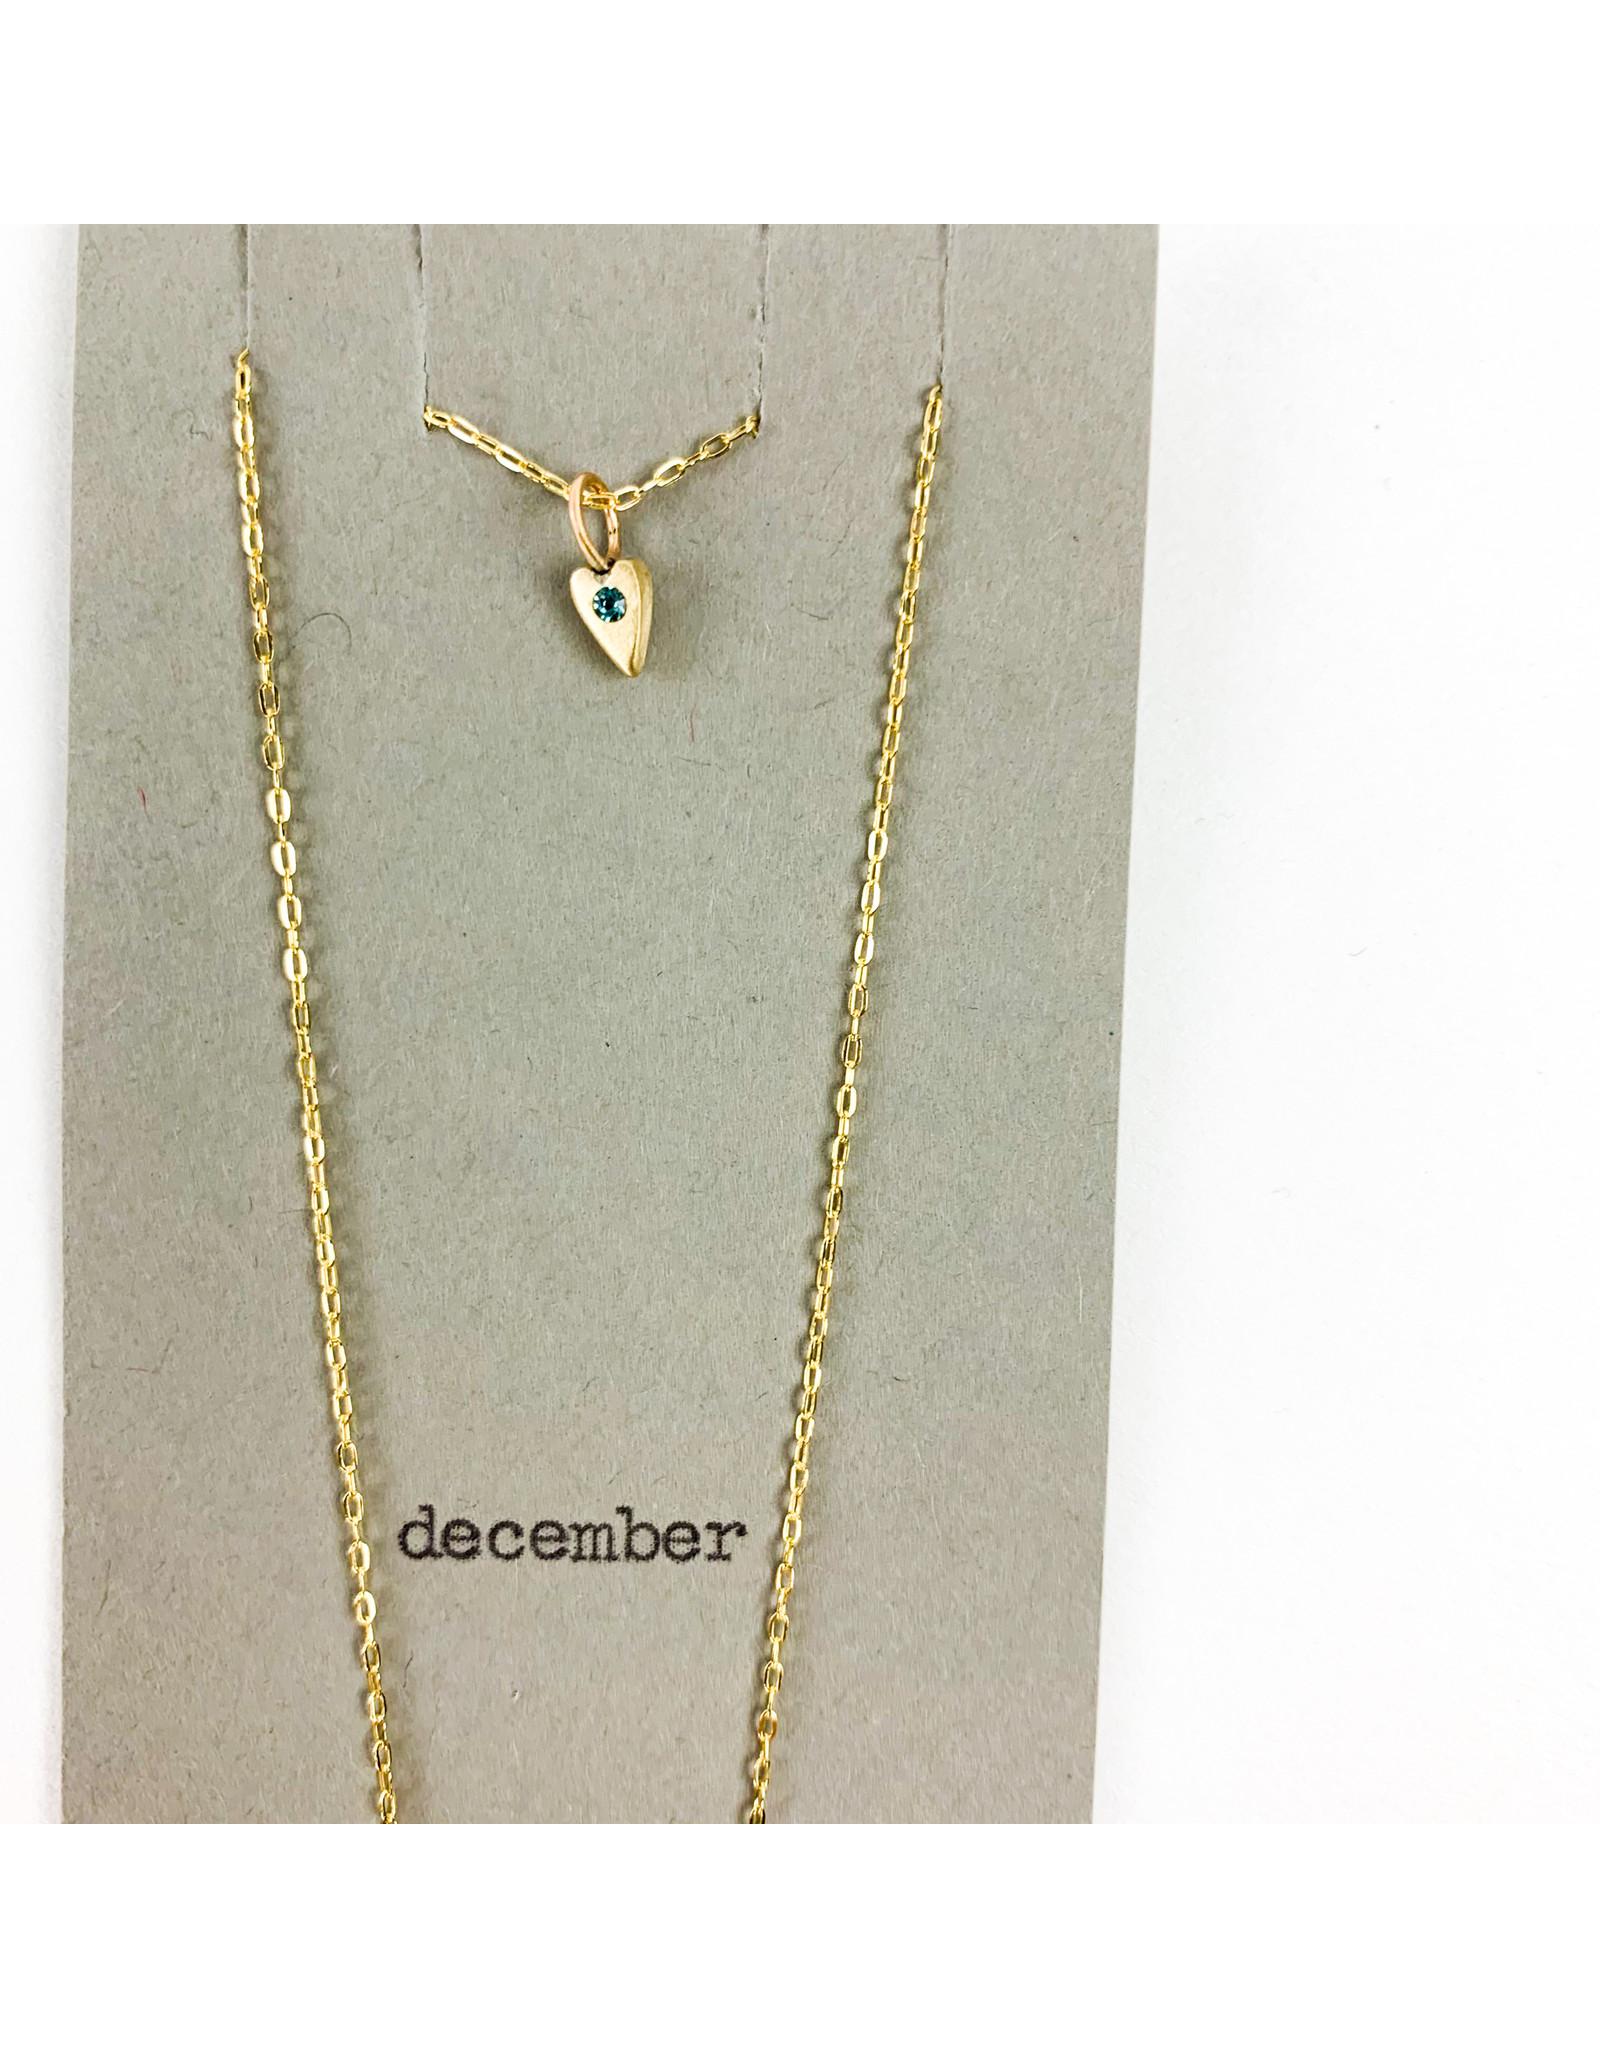 penny larsen December Necklace/ Blue Topaz Gold Chain